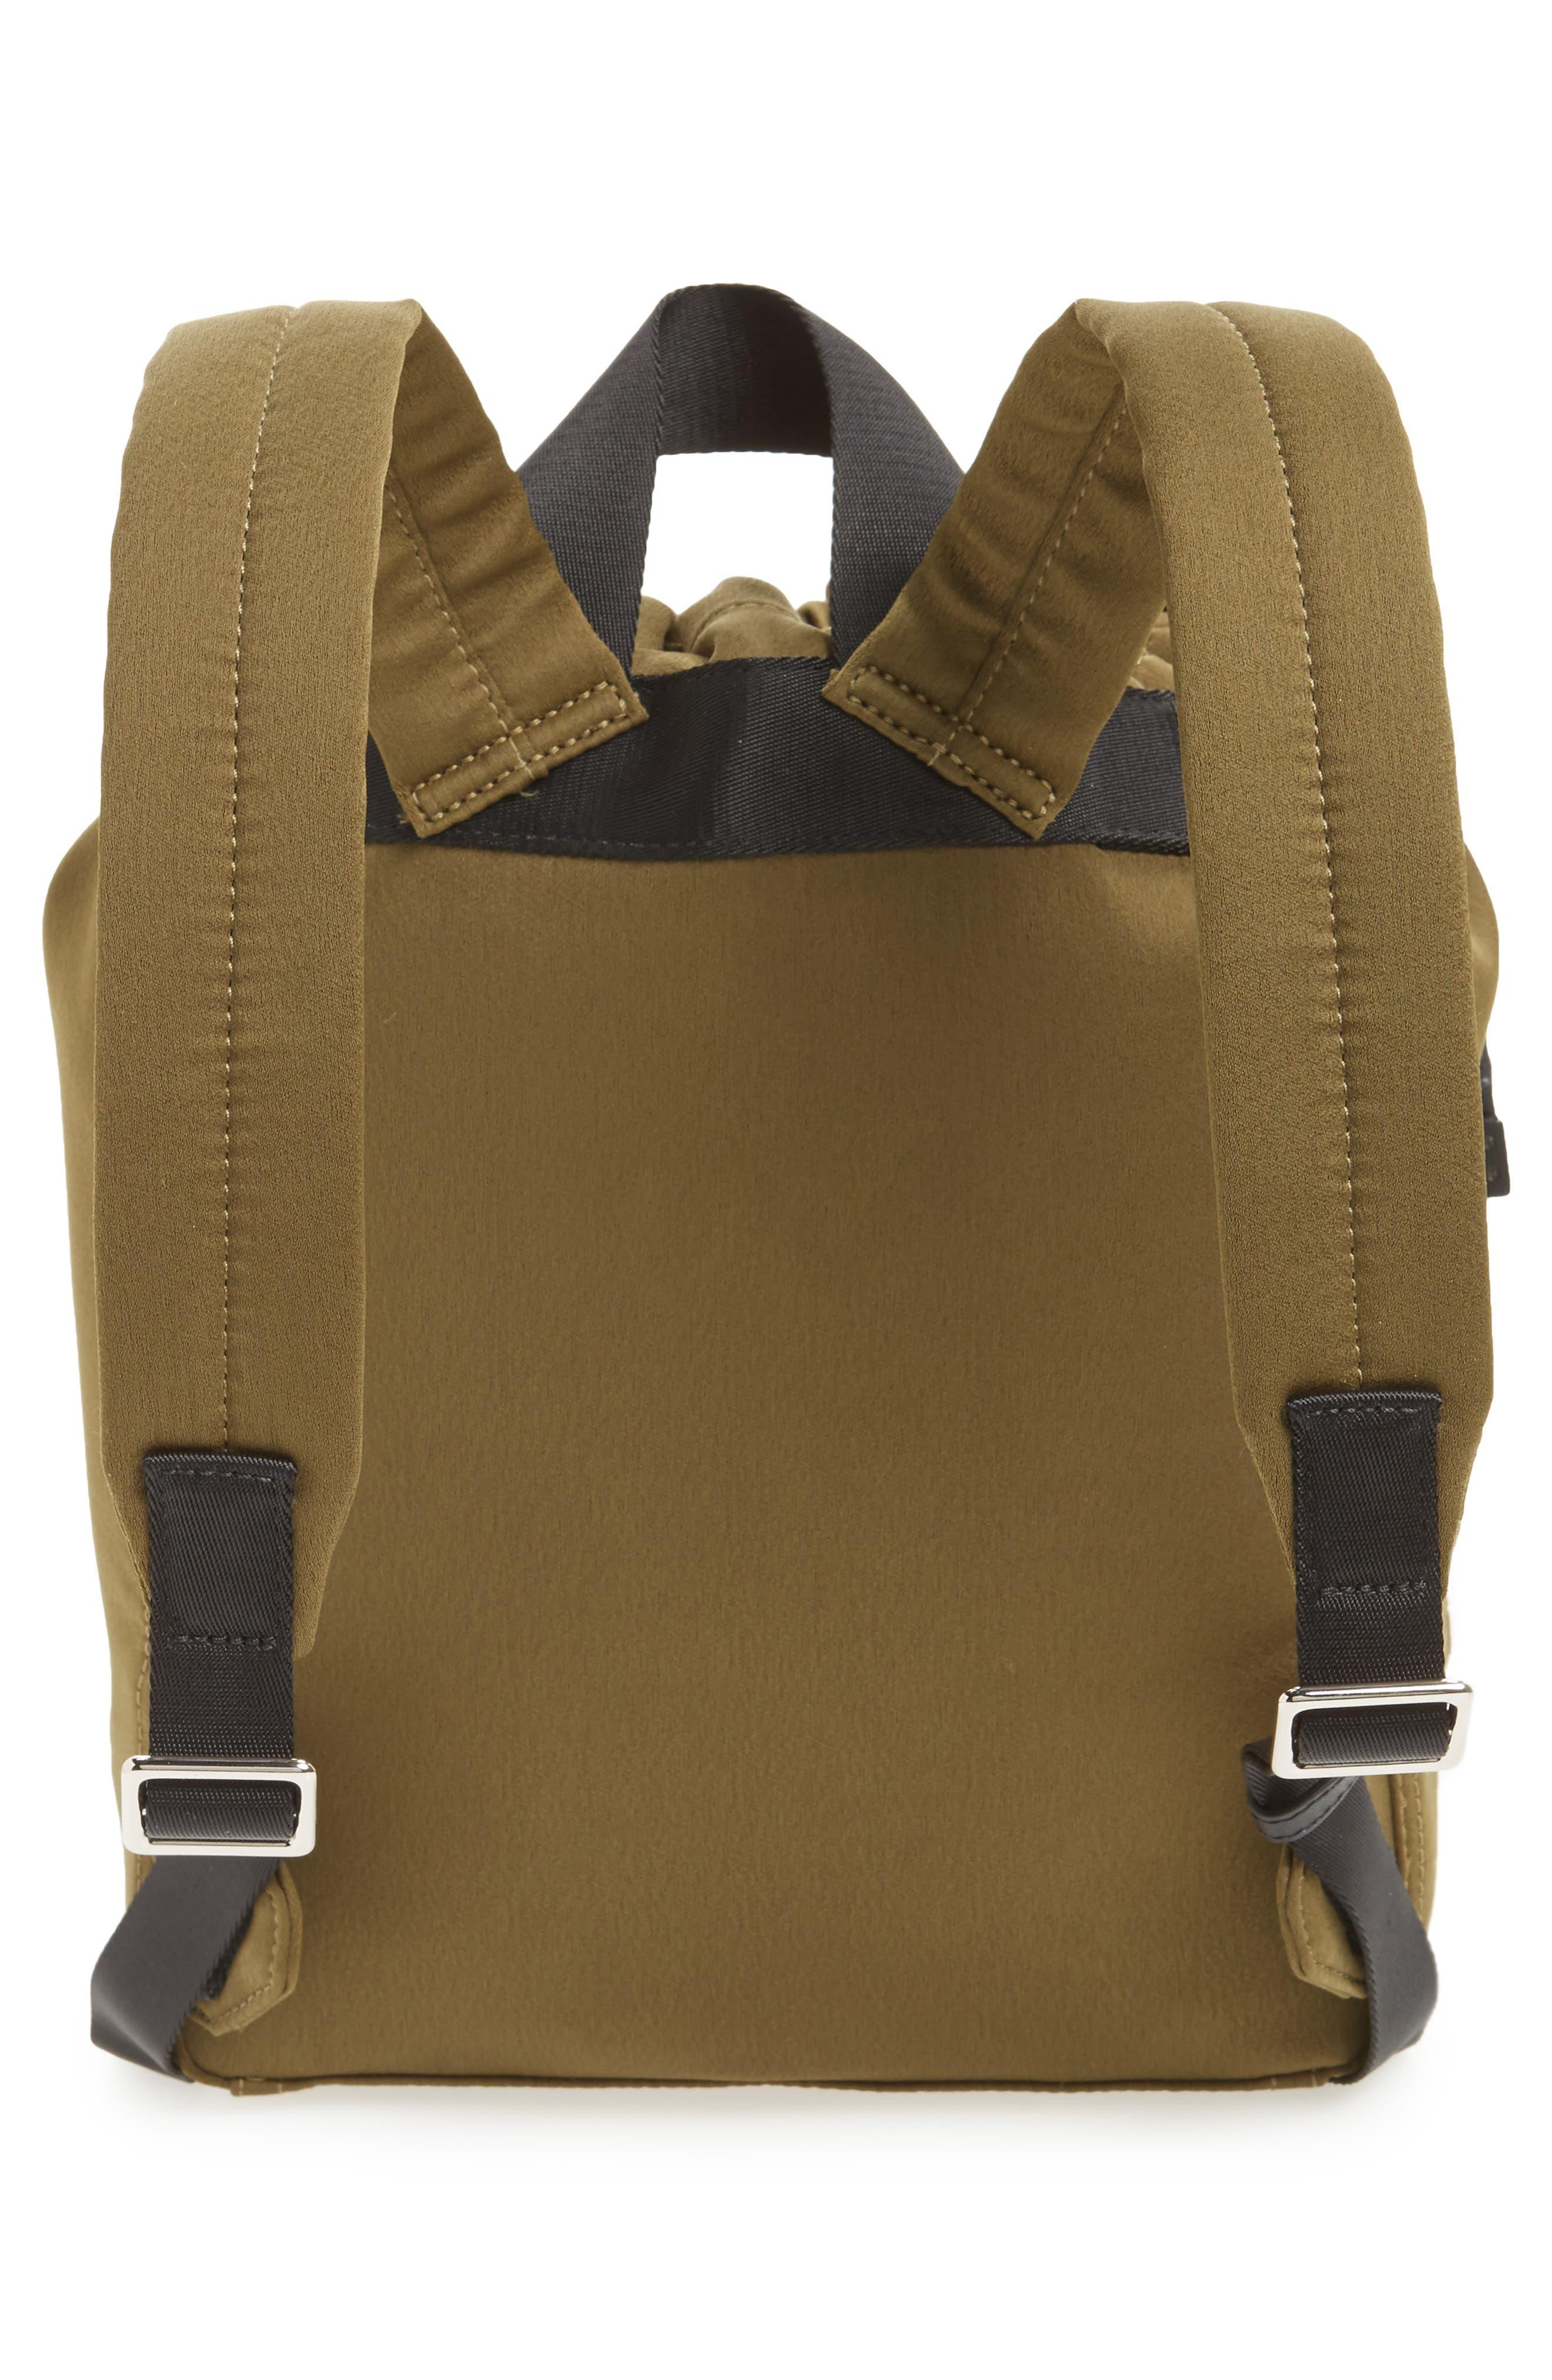 Phillip Lim 3.1 Medium Go-Go Embellished Backpack,                             Alternate thumbnail 3, color,                             Moss